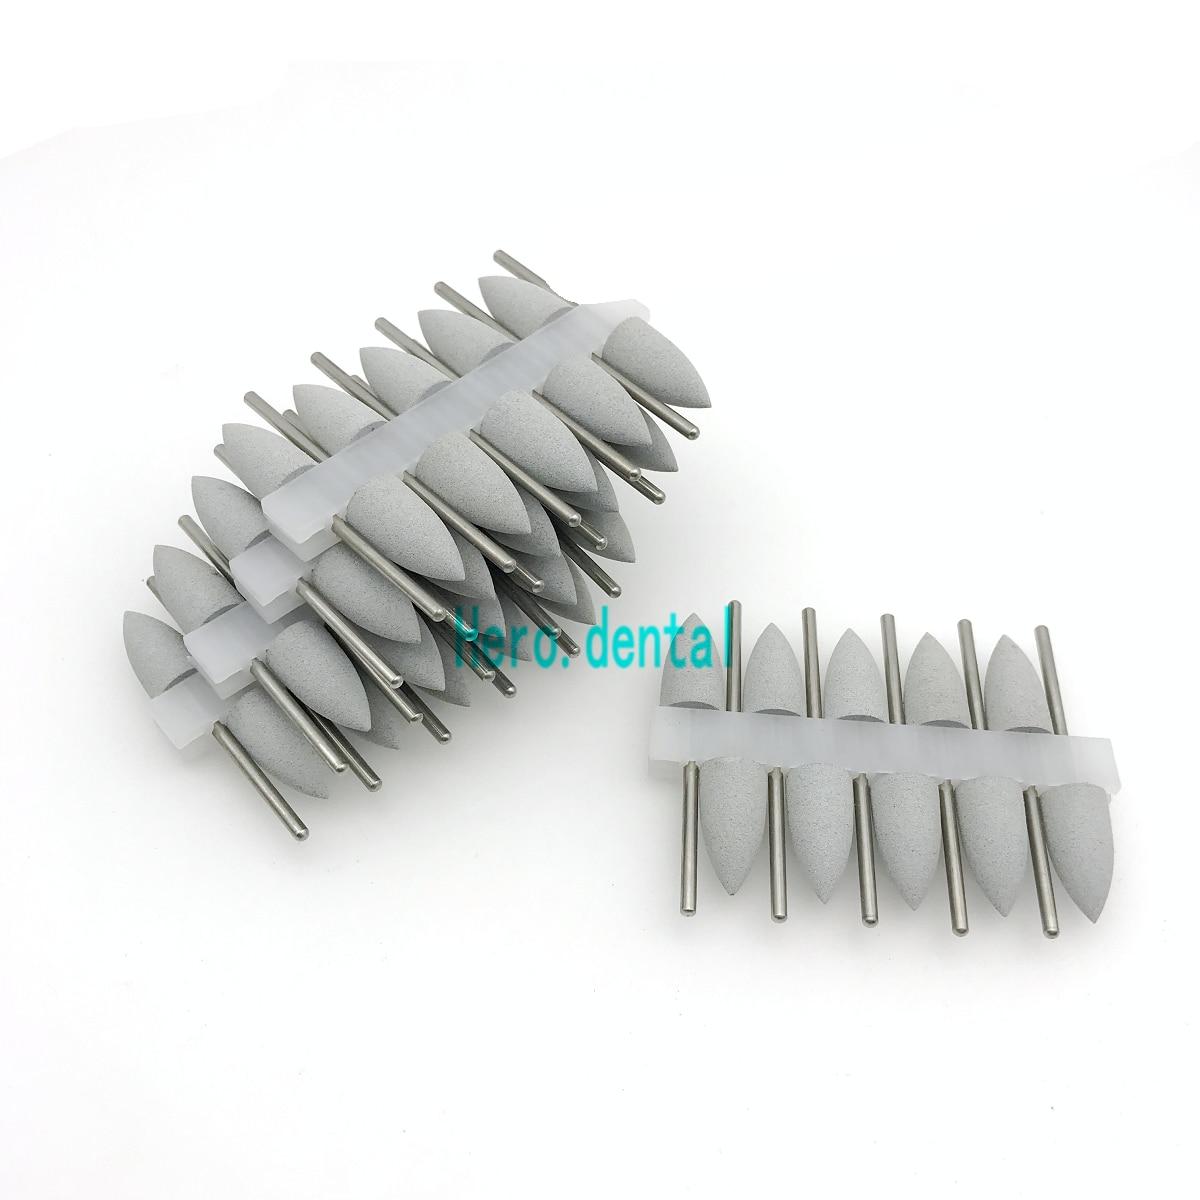 50 Pcs Grey Dental SILICONE Rubber Polishers Dental Polishing Burs 2.35mm Shank